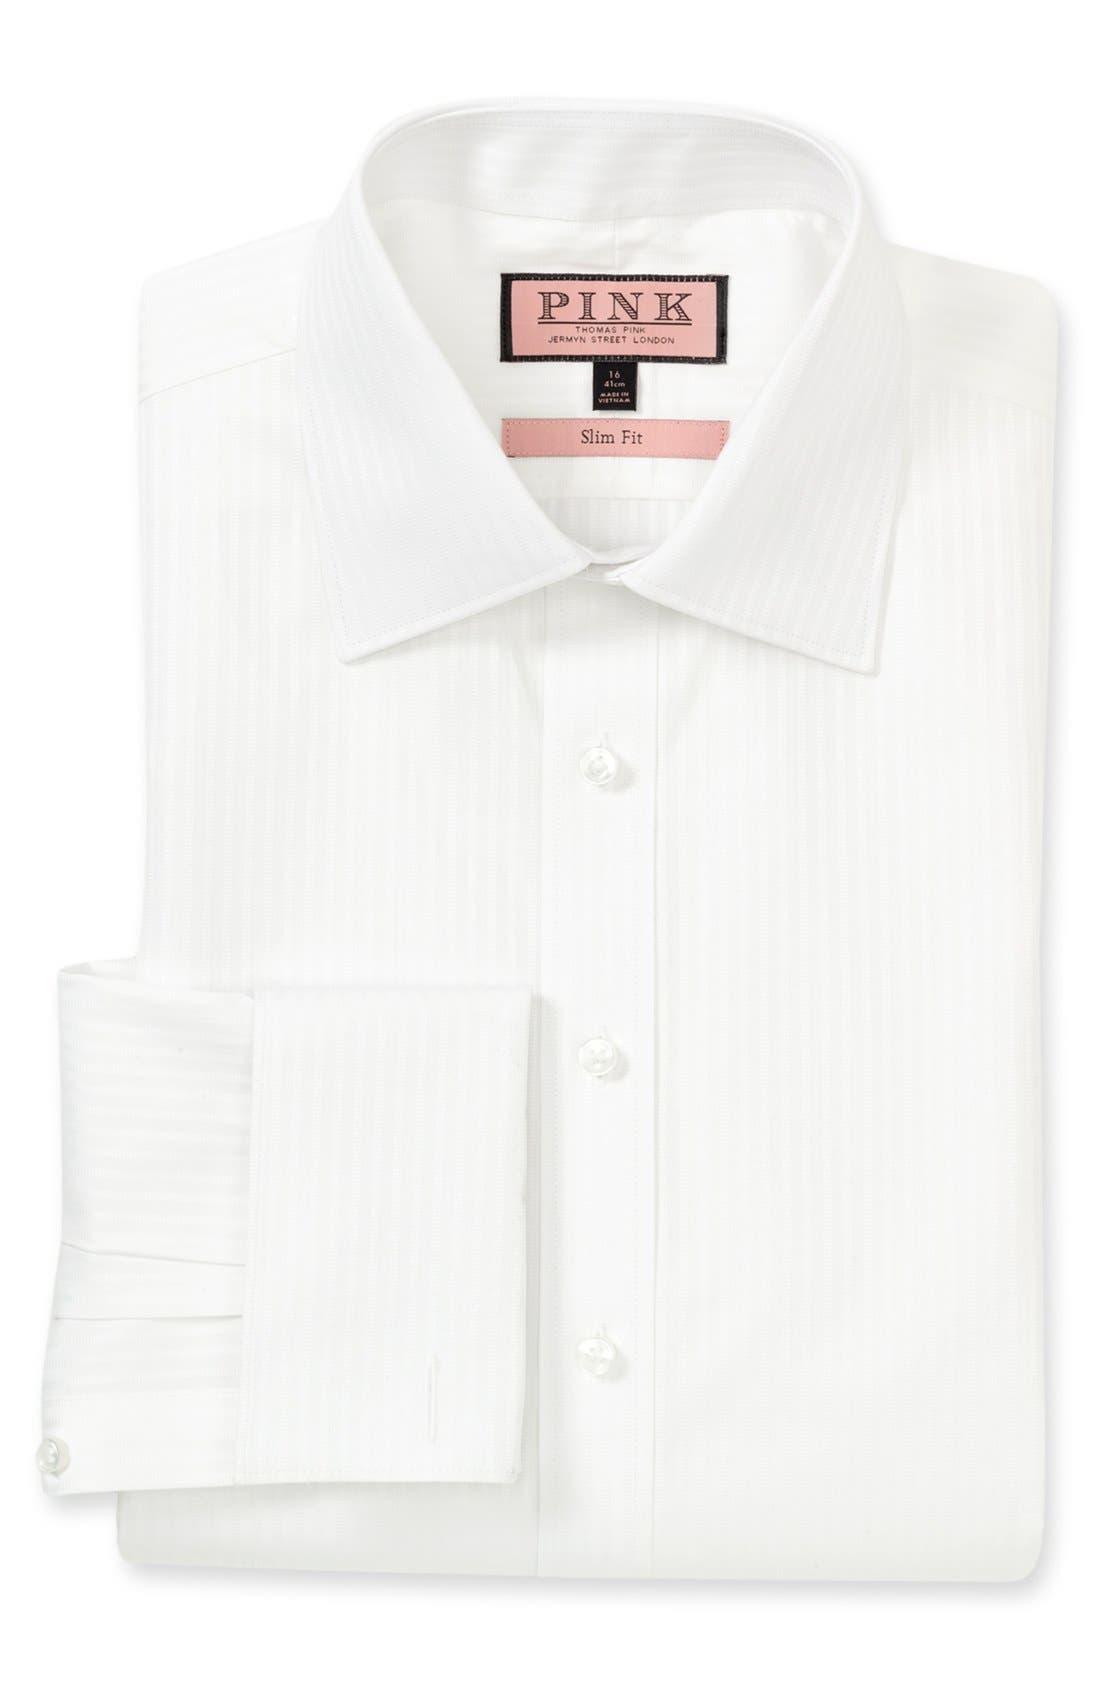 Alternate Image 1 Selected - Thomas Pink 'Steve' Stripe Cotton Slim Fit Dress Shirt